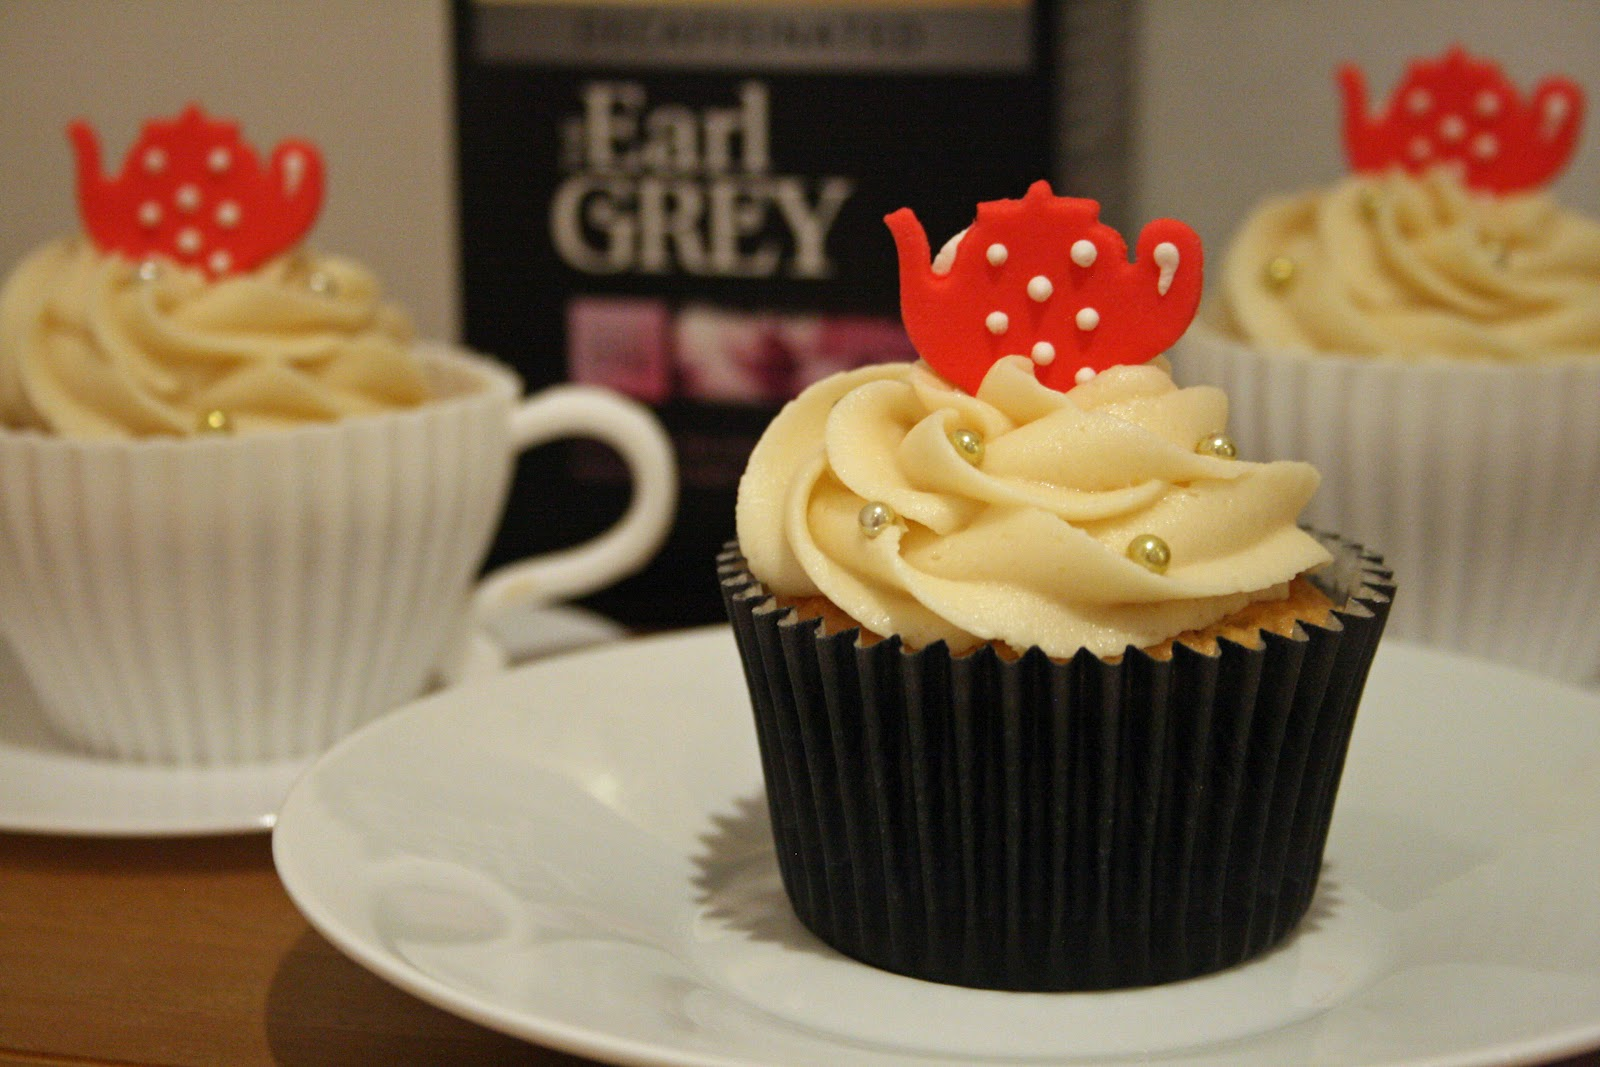 Earl Gray Cupcakes